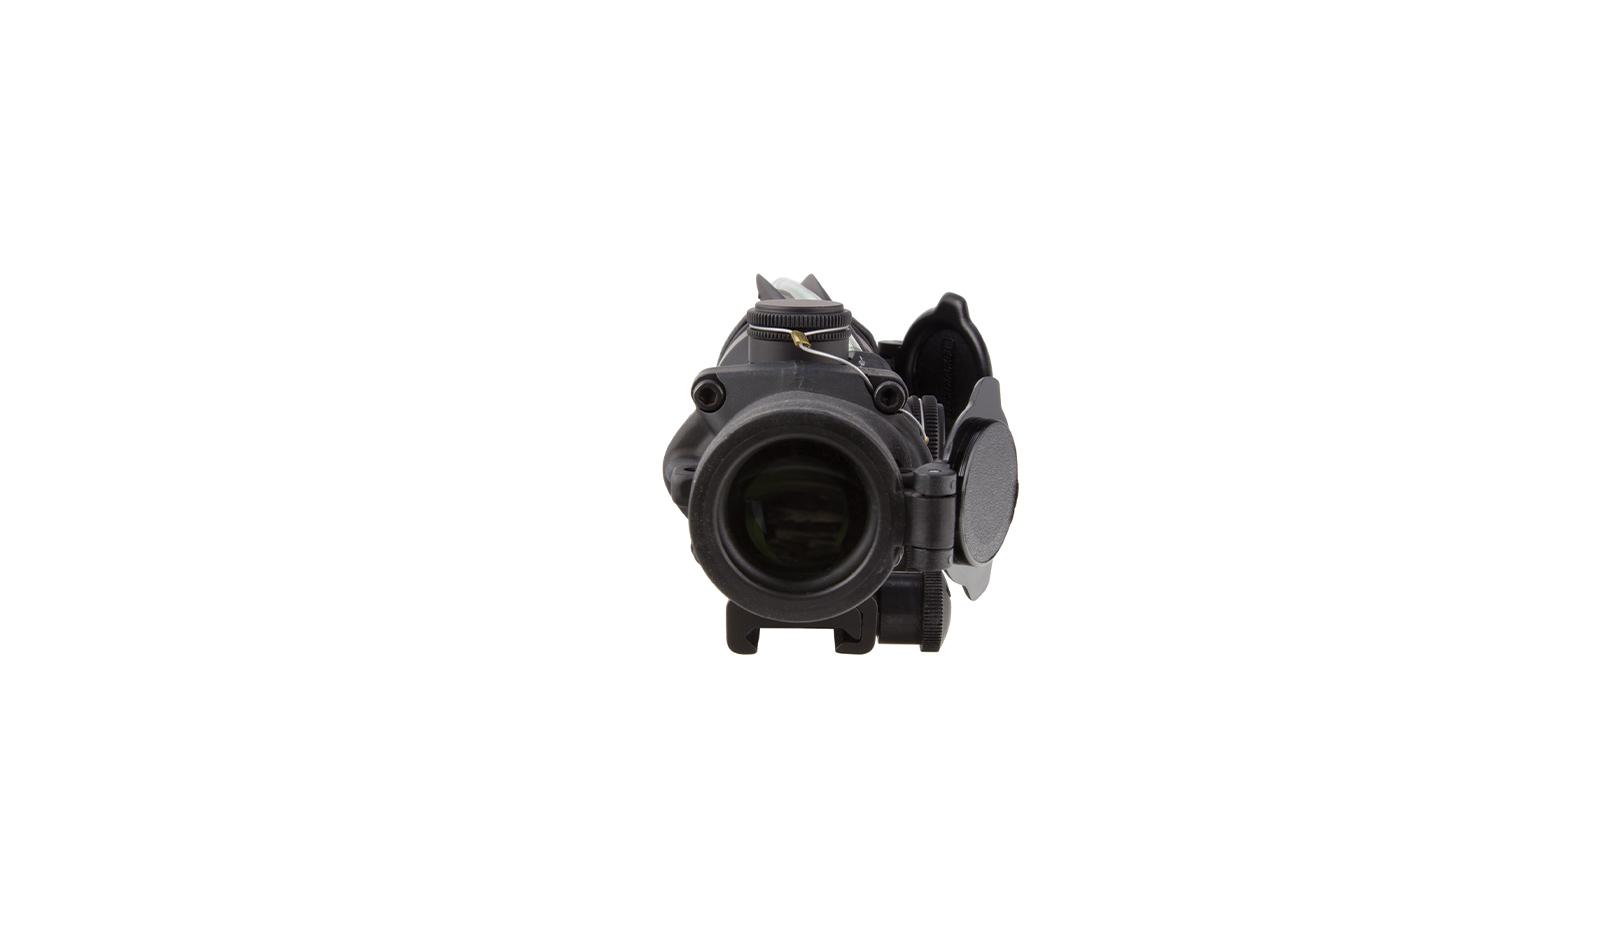 TA31RCO-M150CP-G angle 4